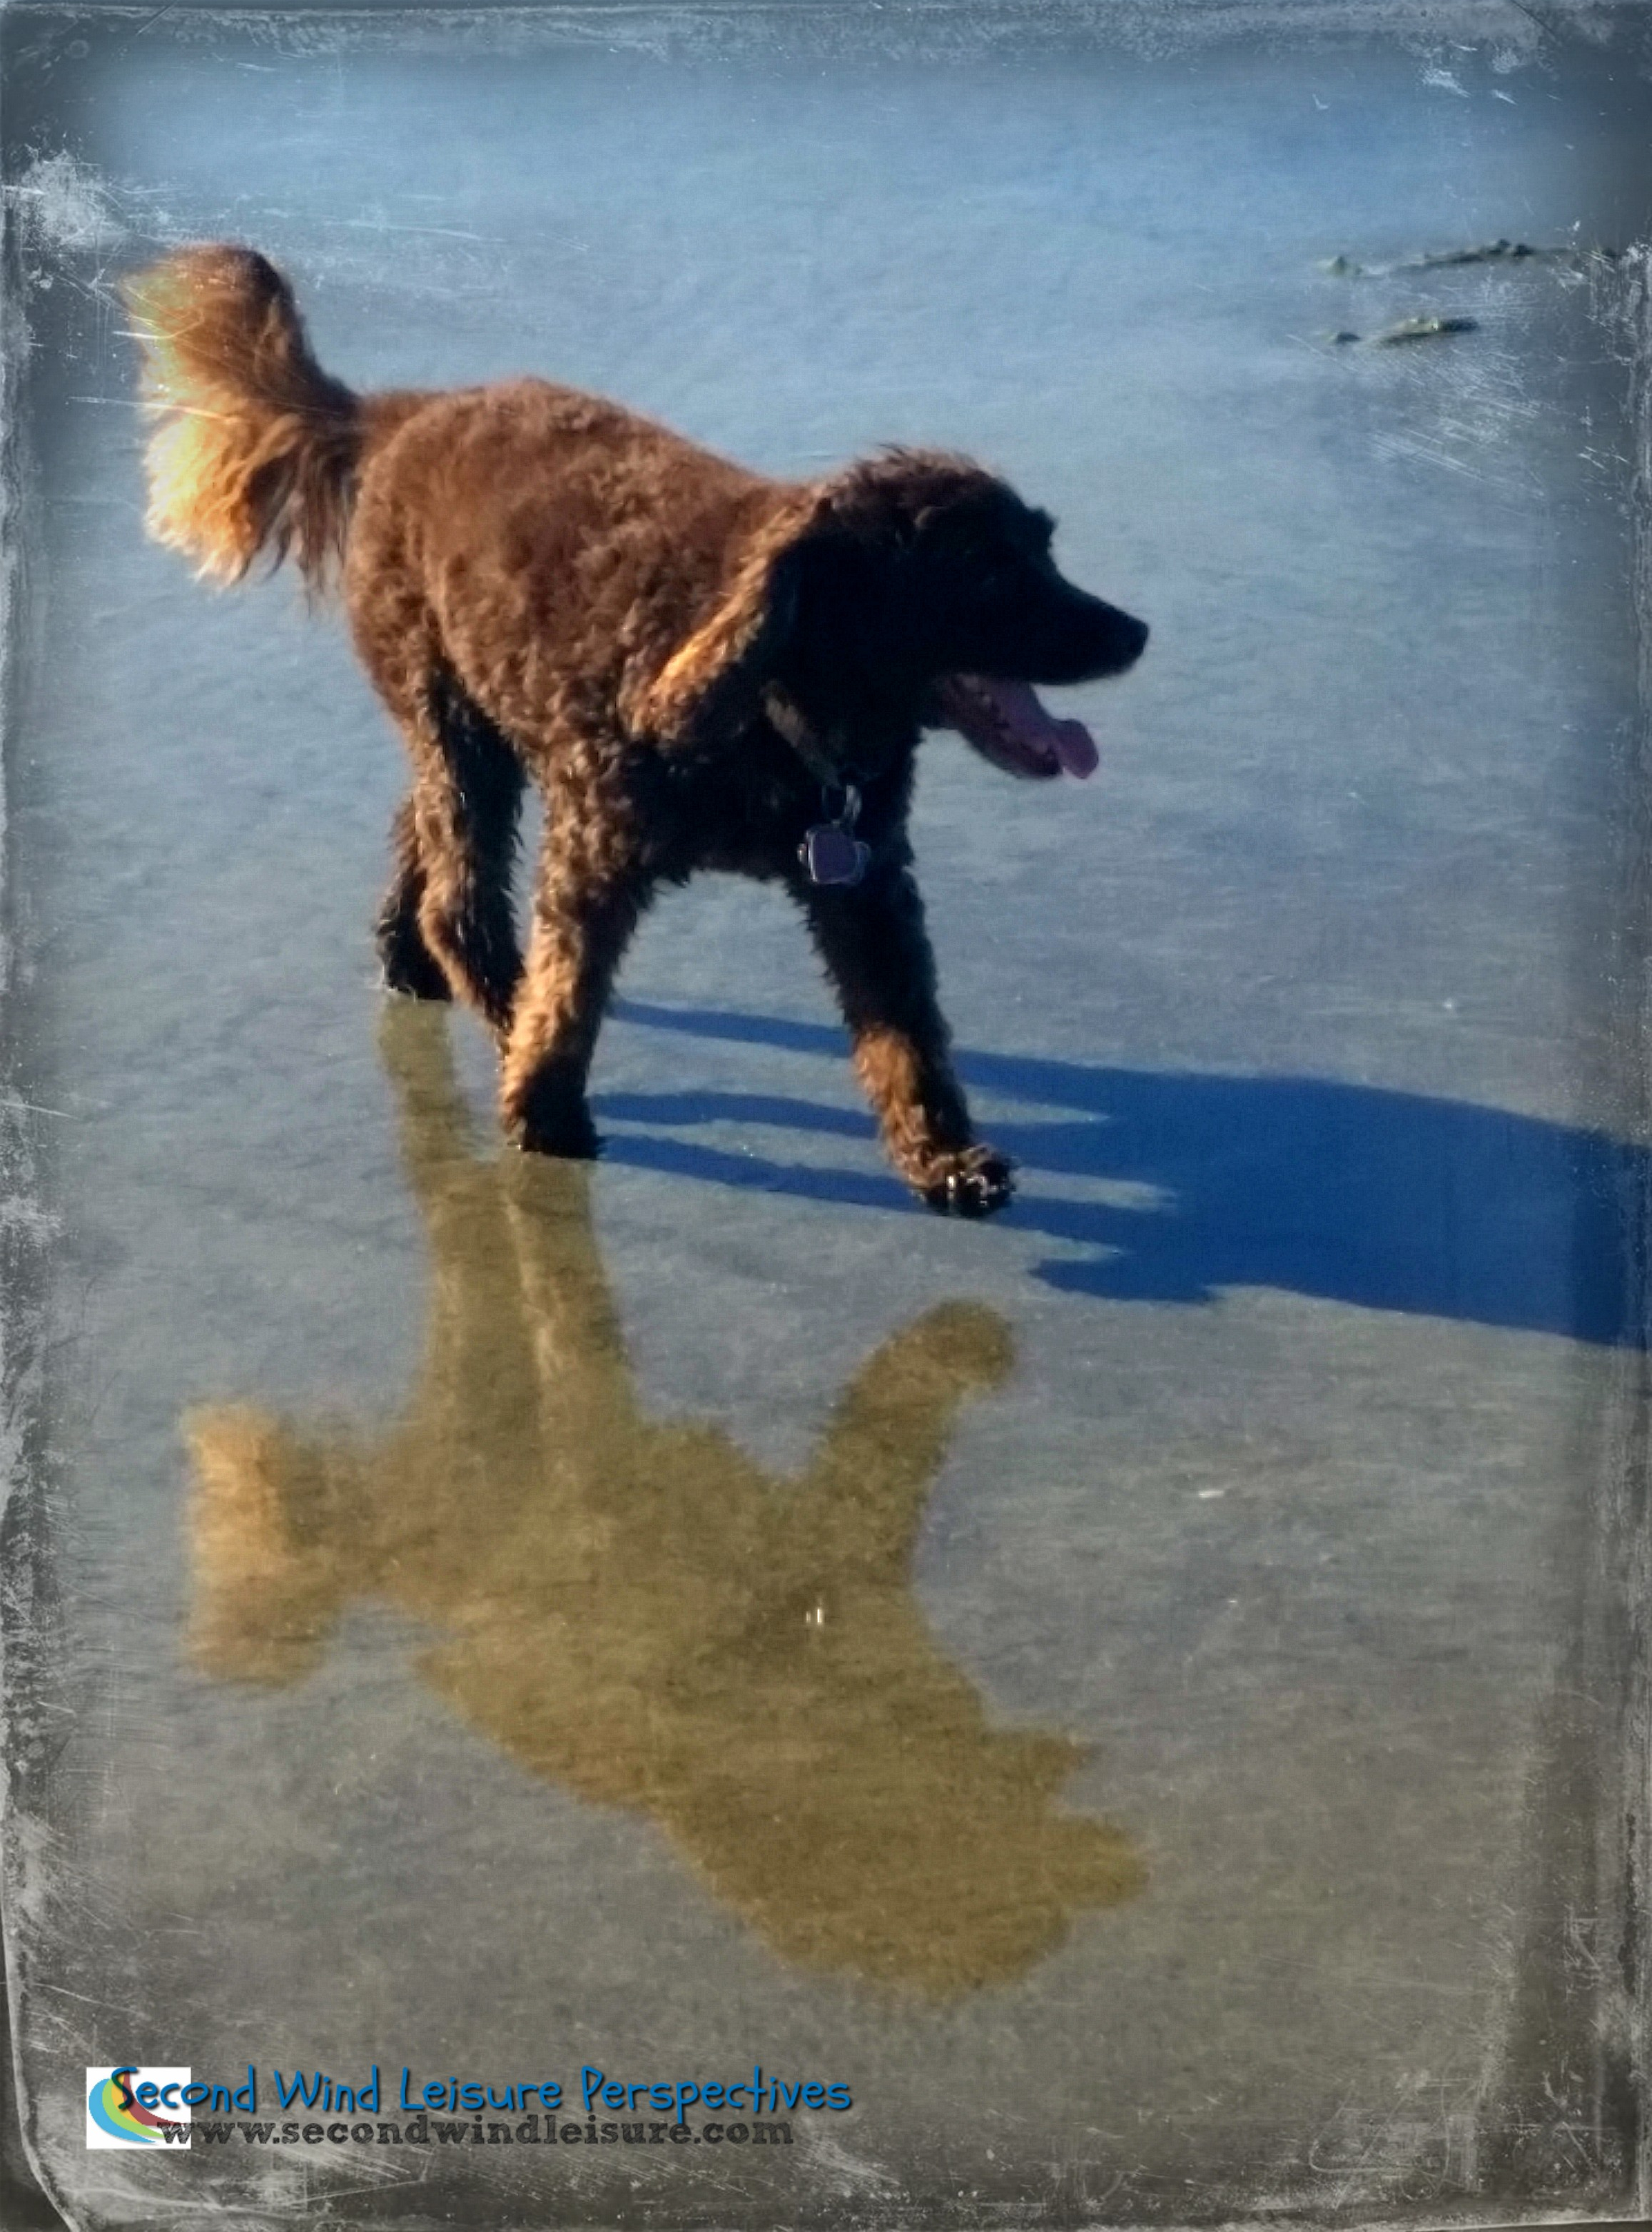 Aero cavorts on dog beach accompanied by his shadow and reflection